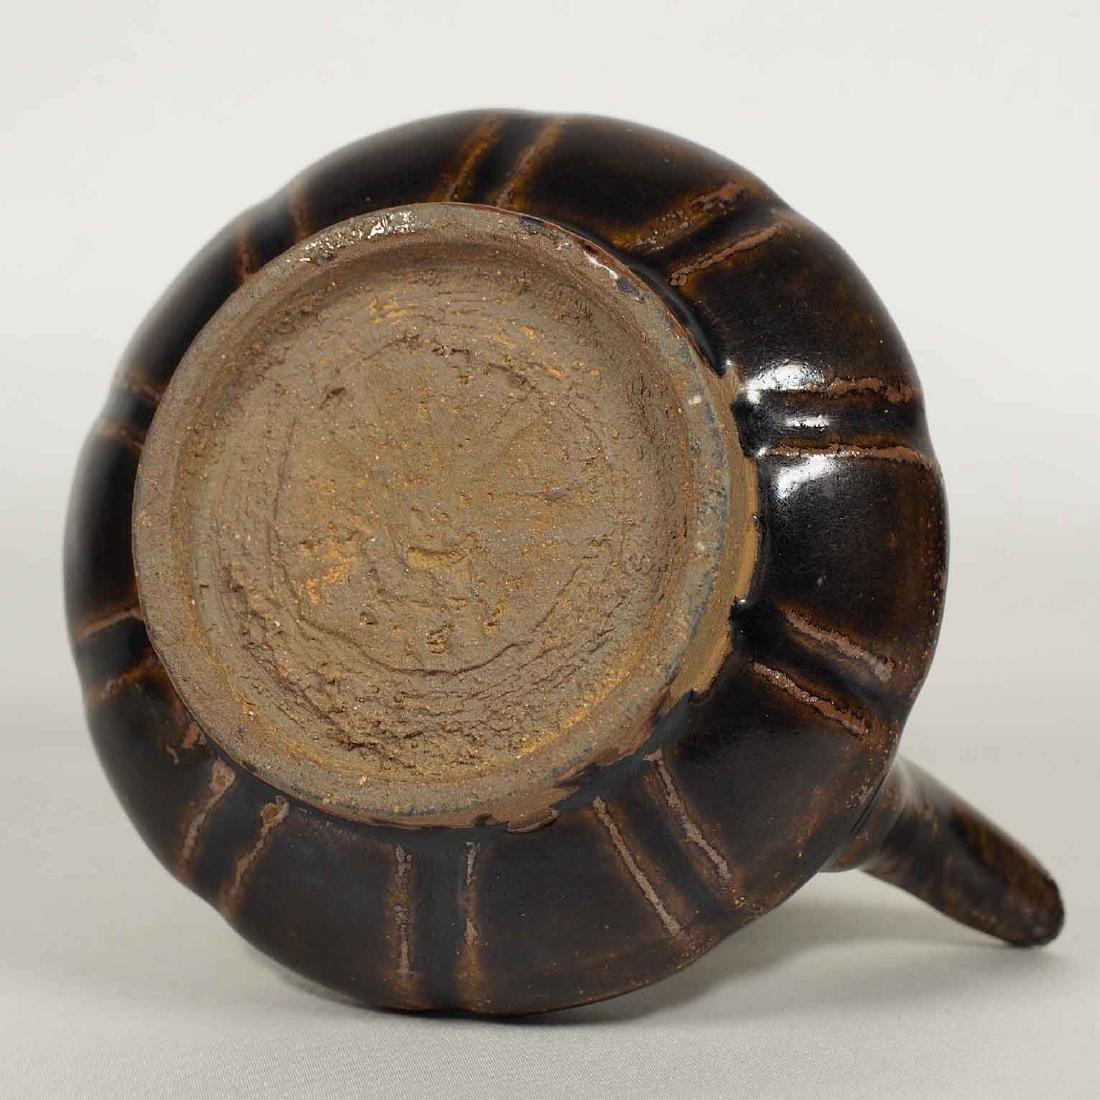 Black glazed Arabic Style Ewer with Lid, Song Dynasty - 10